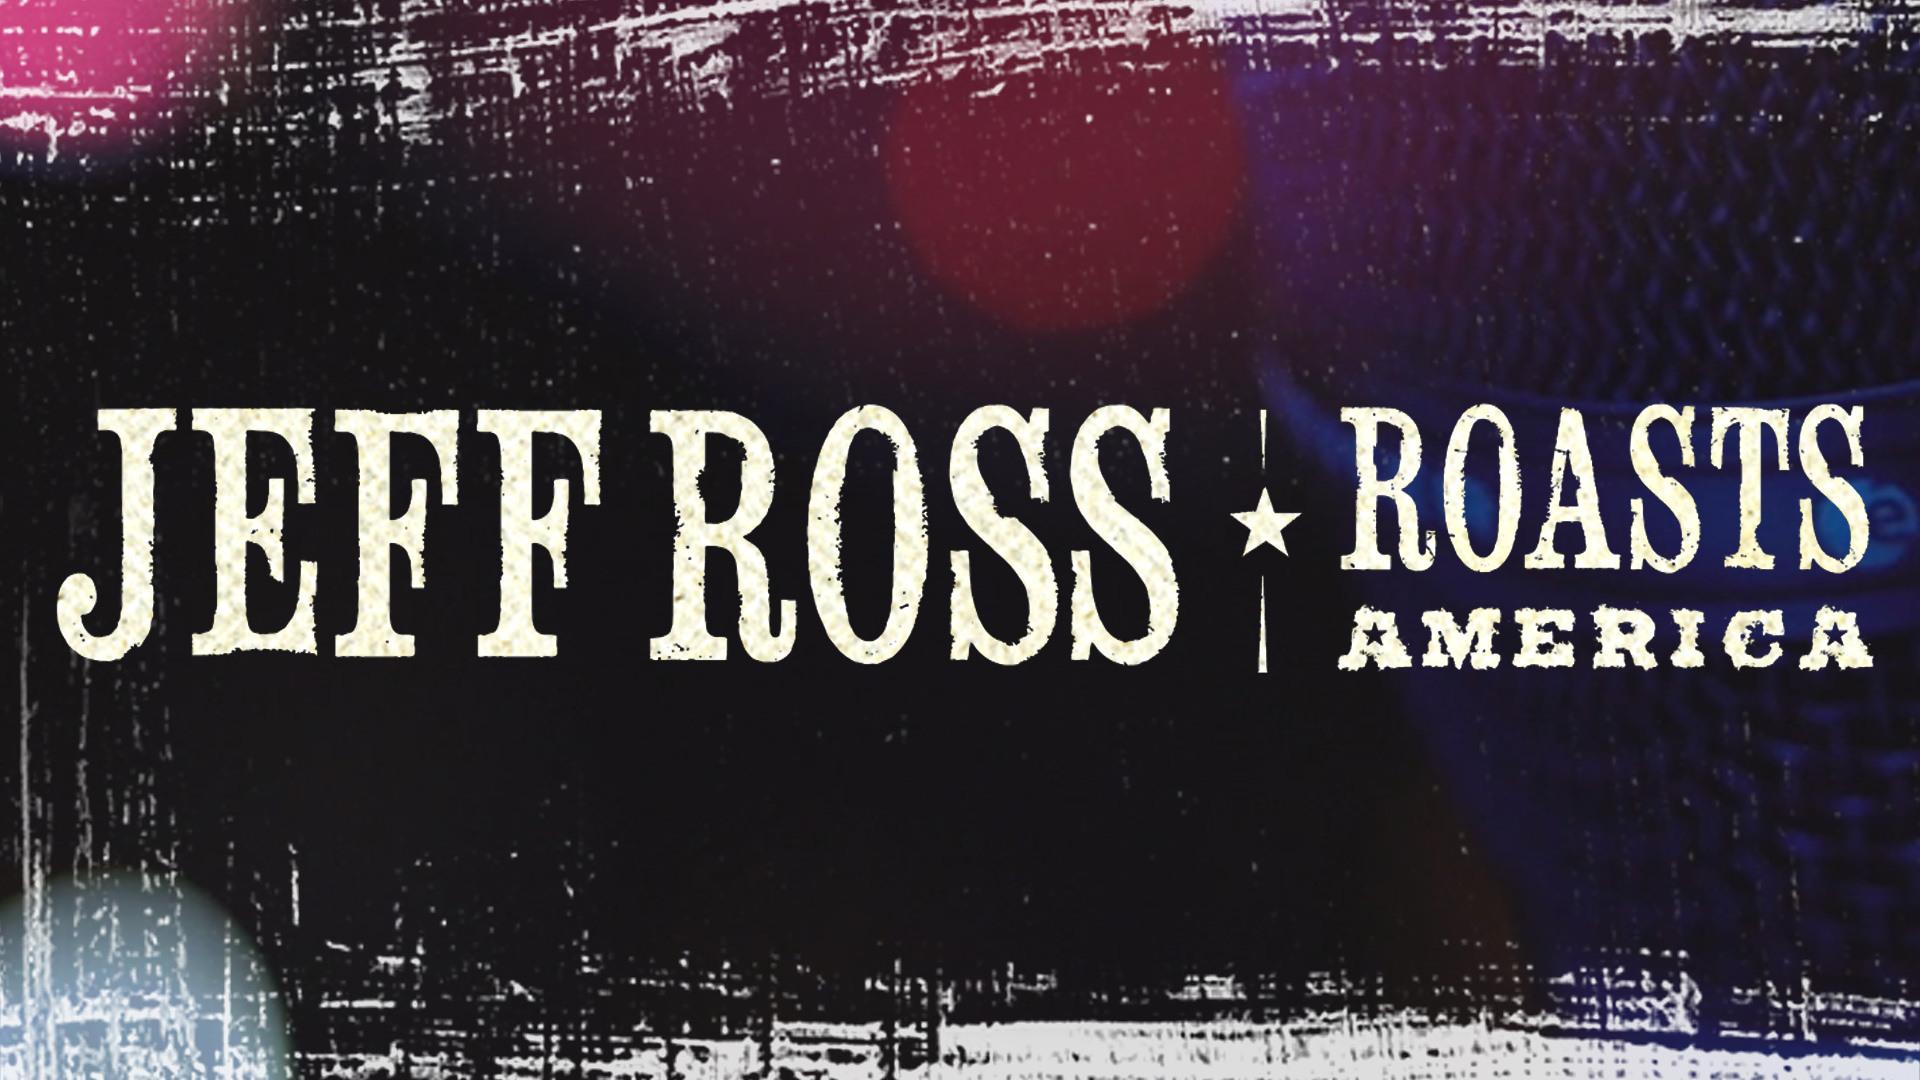 JEFF ROSS - ROASTS AMERICA